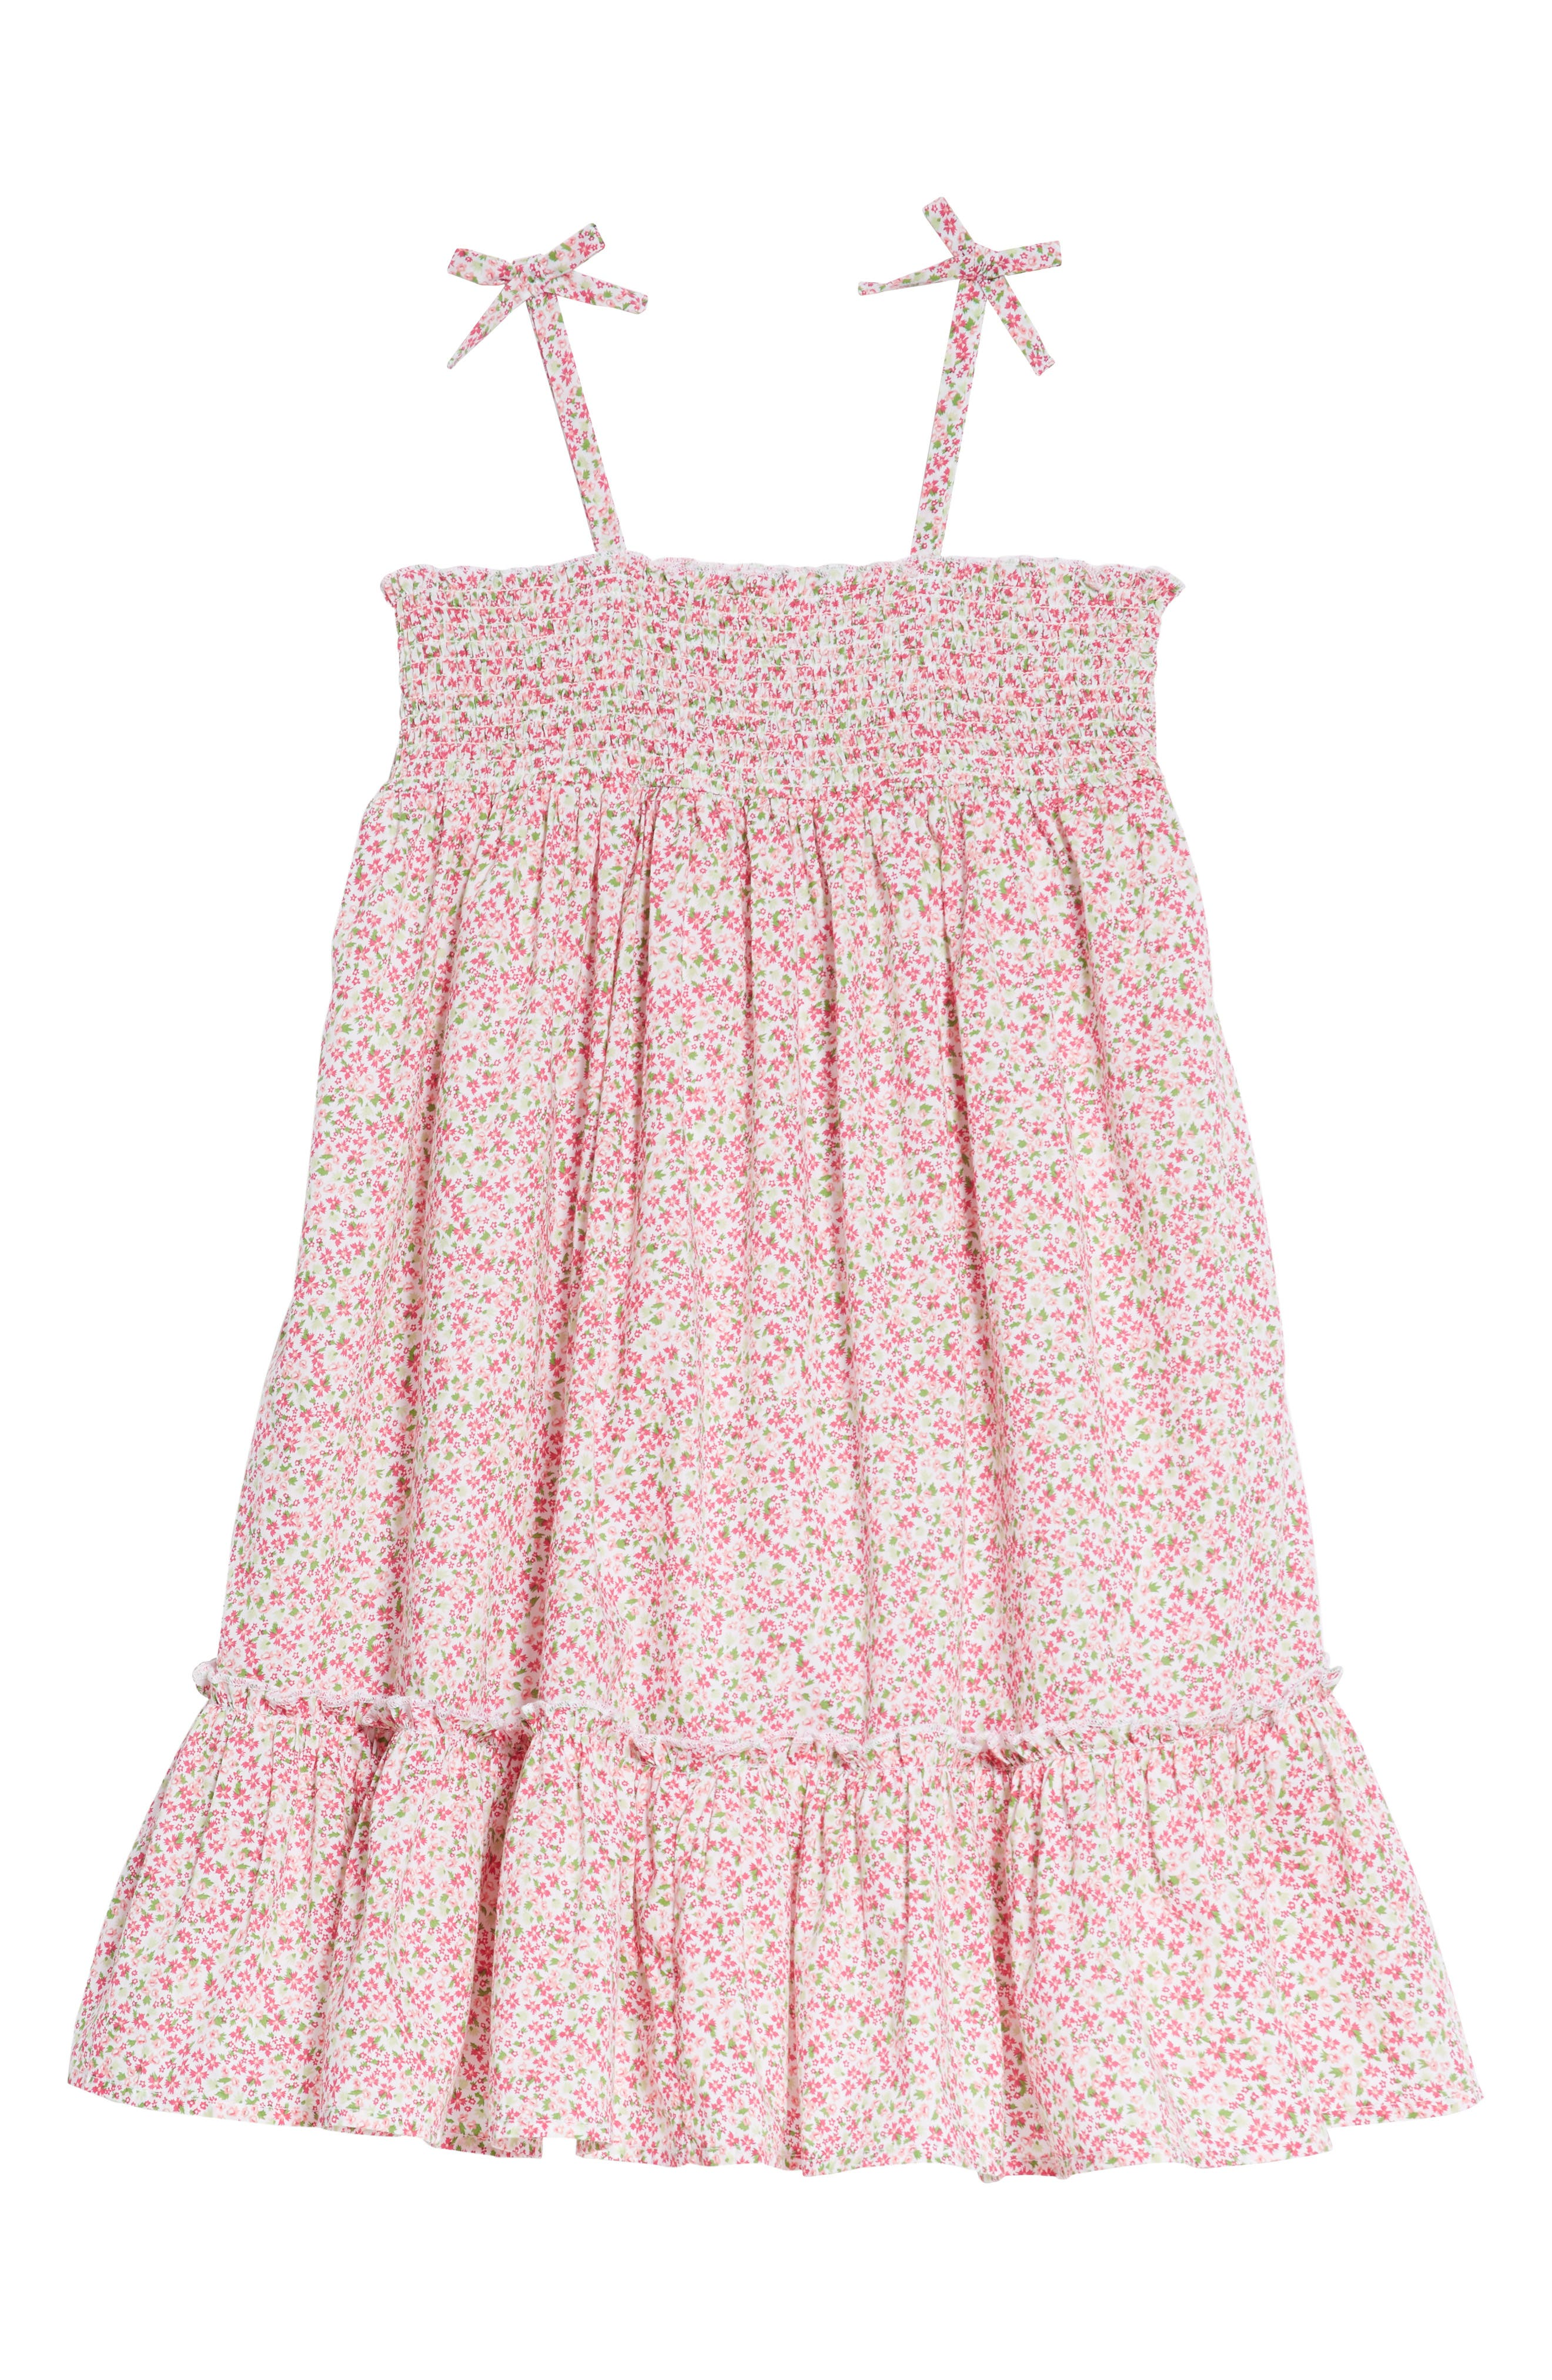 Smocked Ditzy Dress,                             Main thumbnail 1, color,                             White- Pink Dense Floral